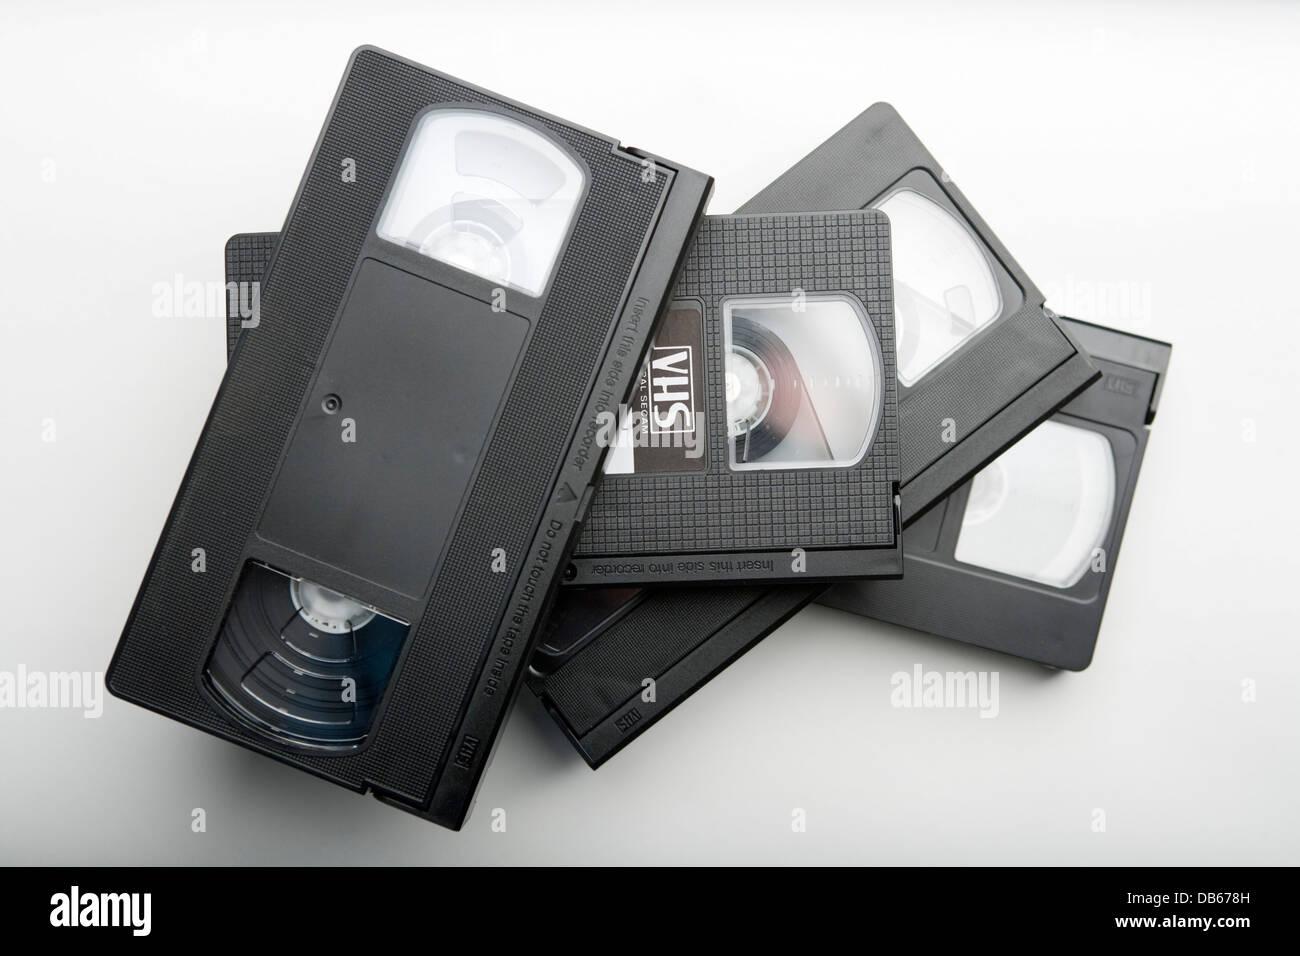 Black VHS cassette tapes. - Stock Image